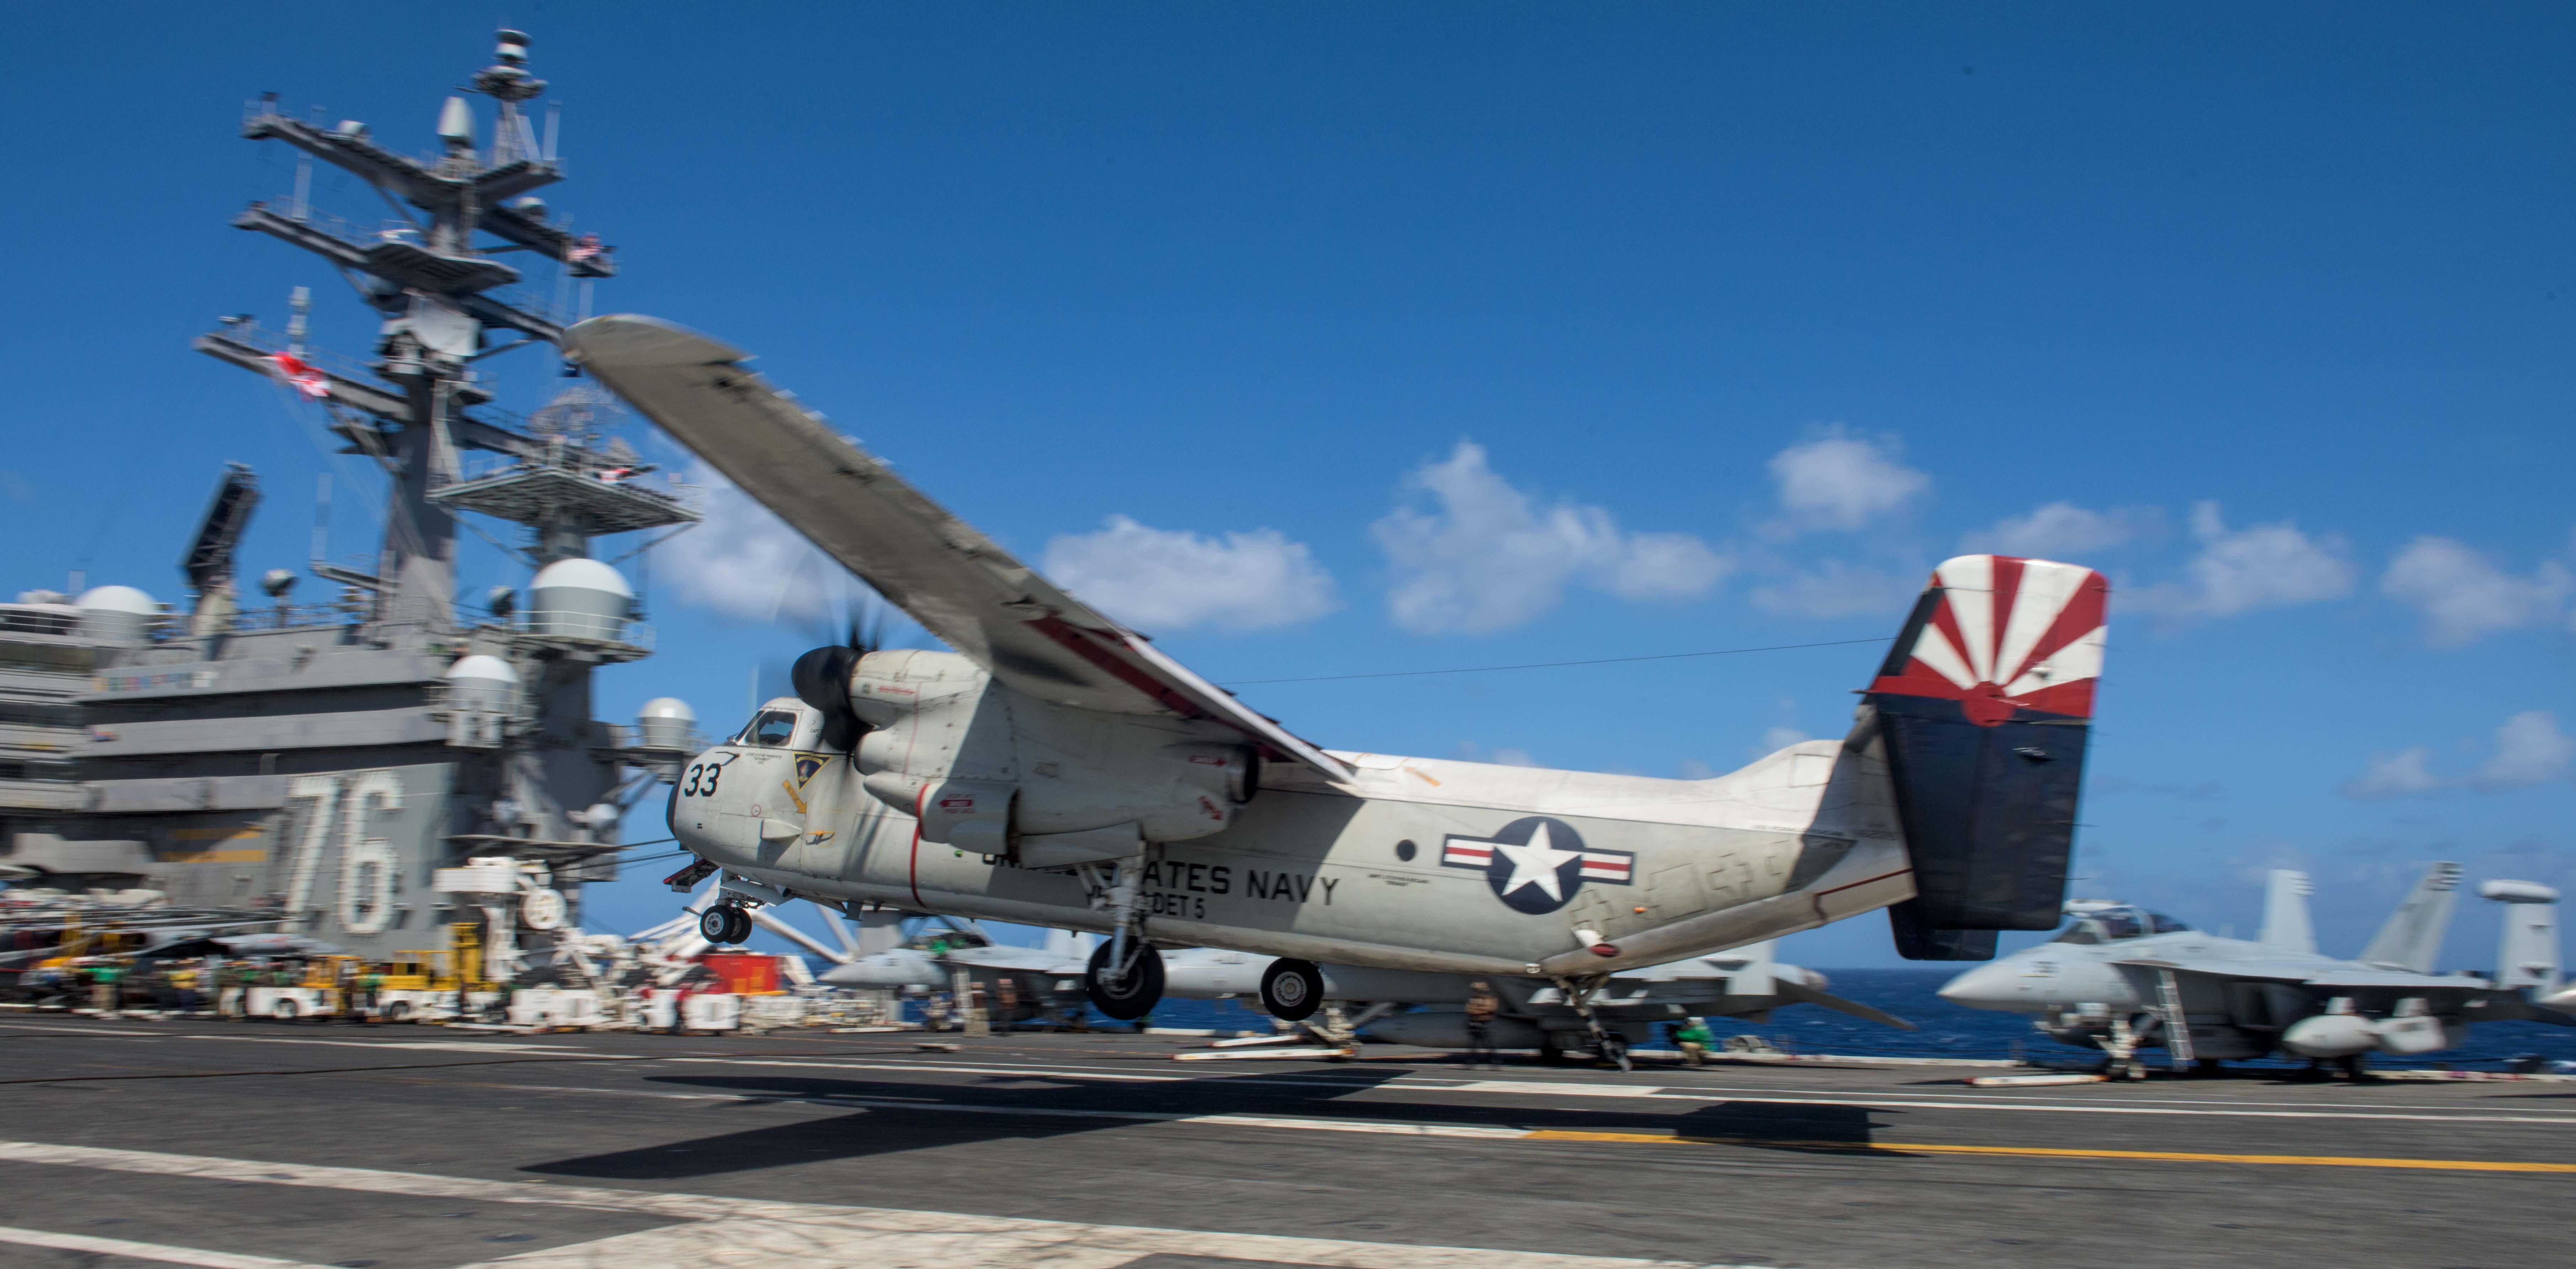 us navy c-2 greyhound